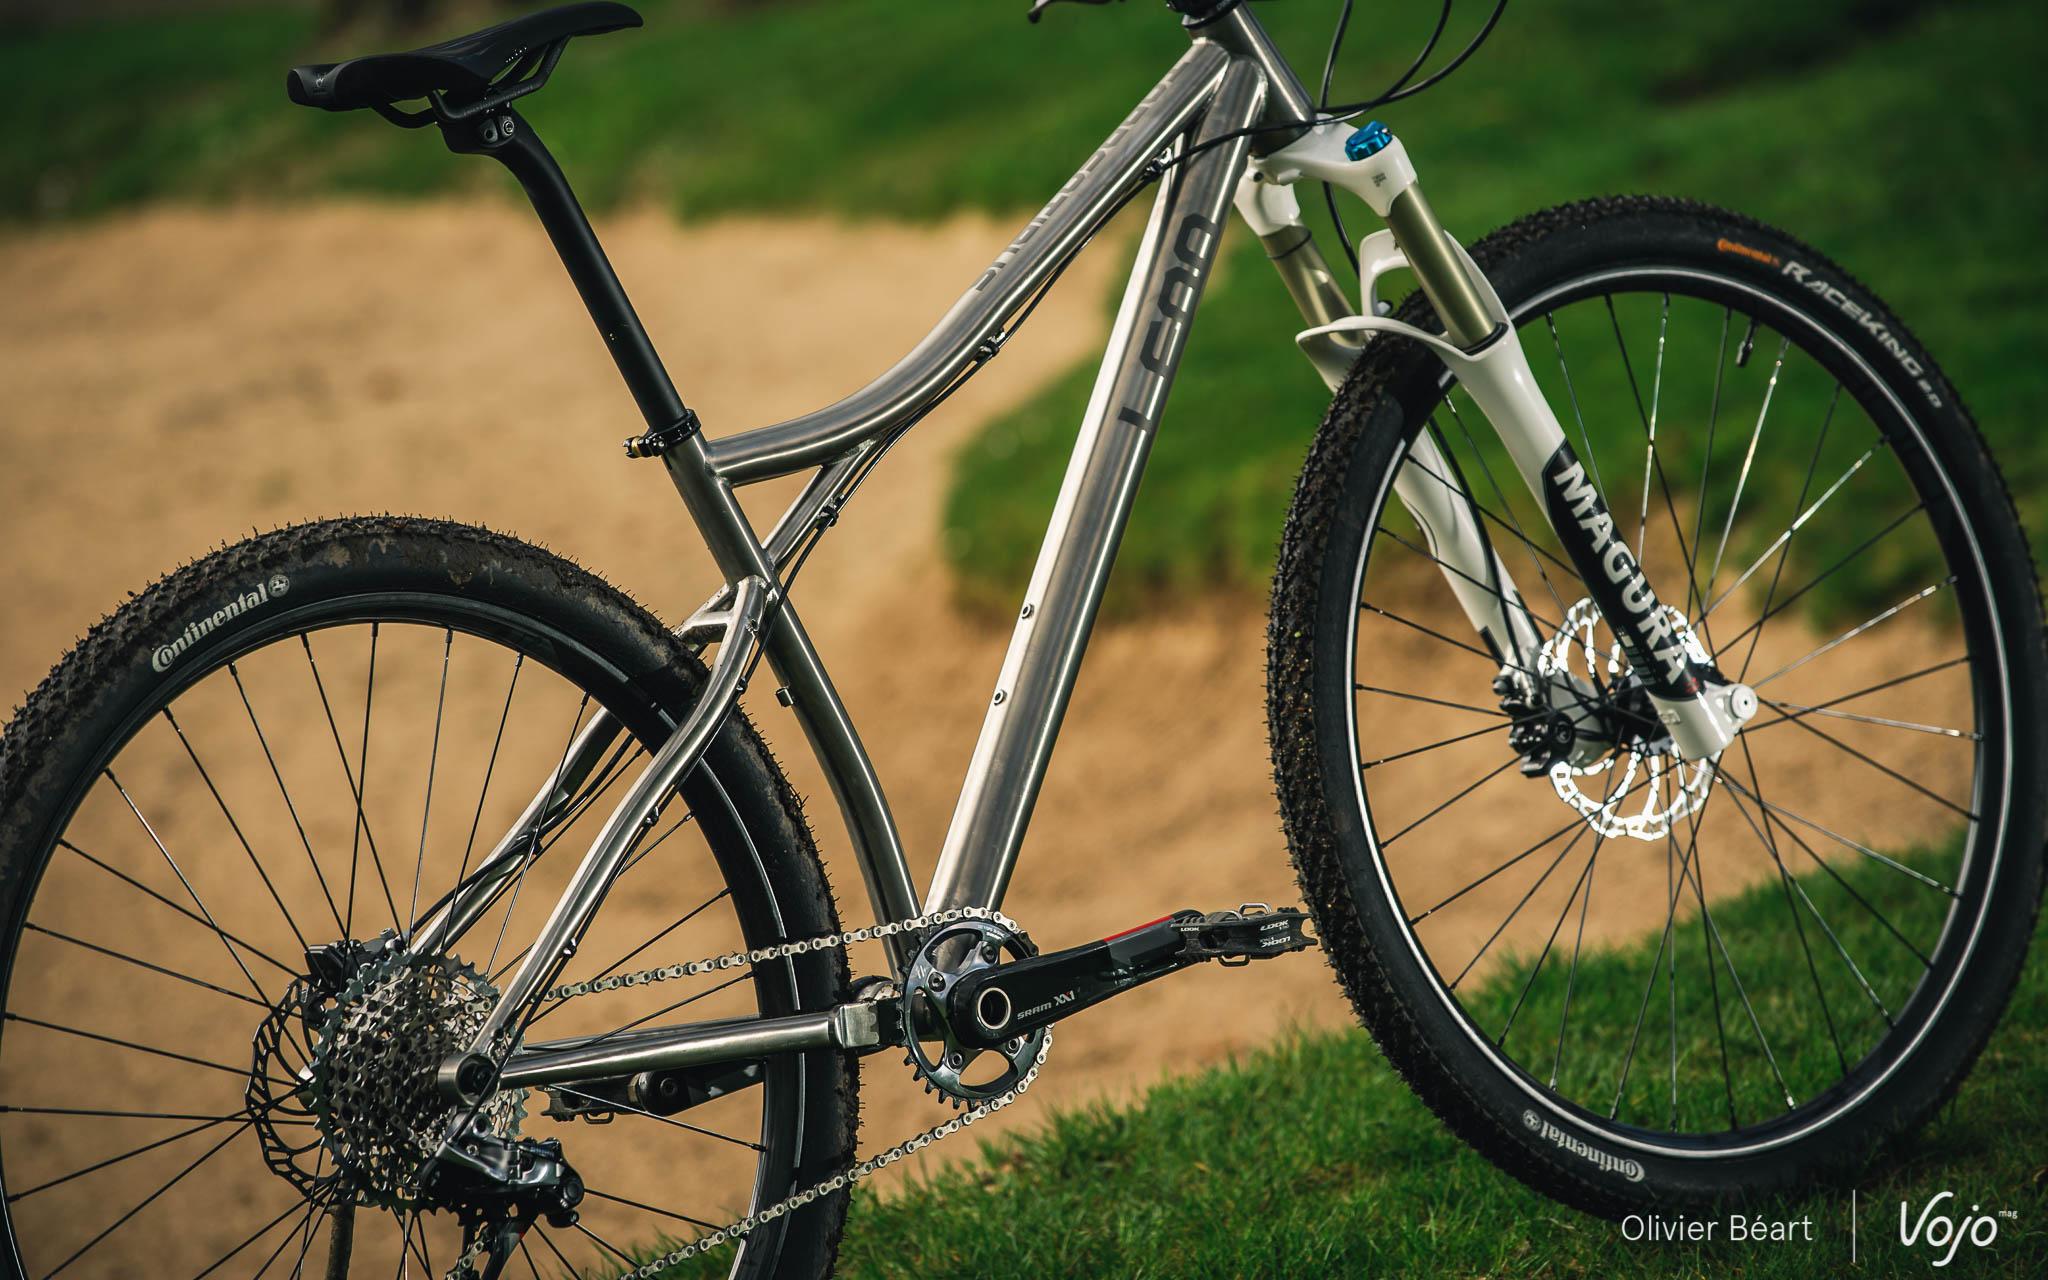 cycles_leon_decouverte_copyright_obeart_vojomag-39